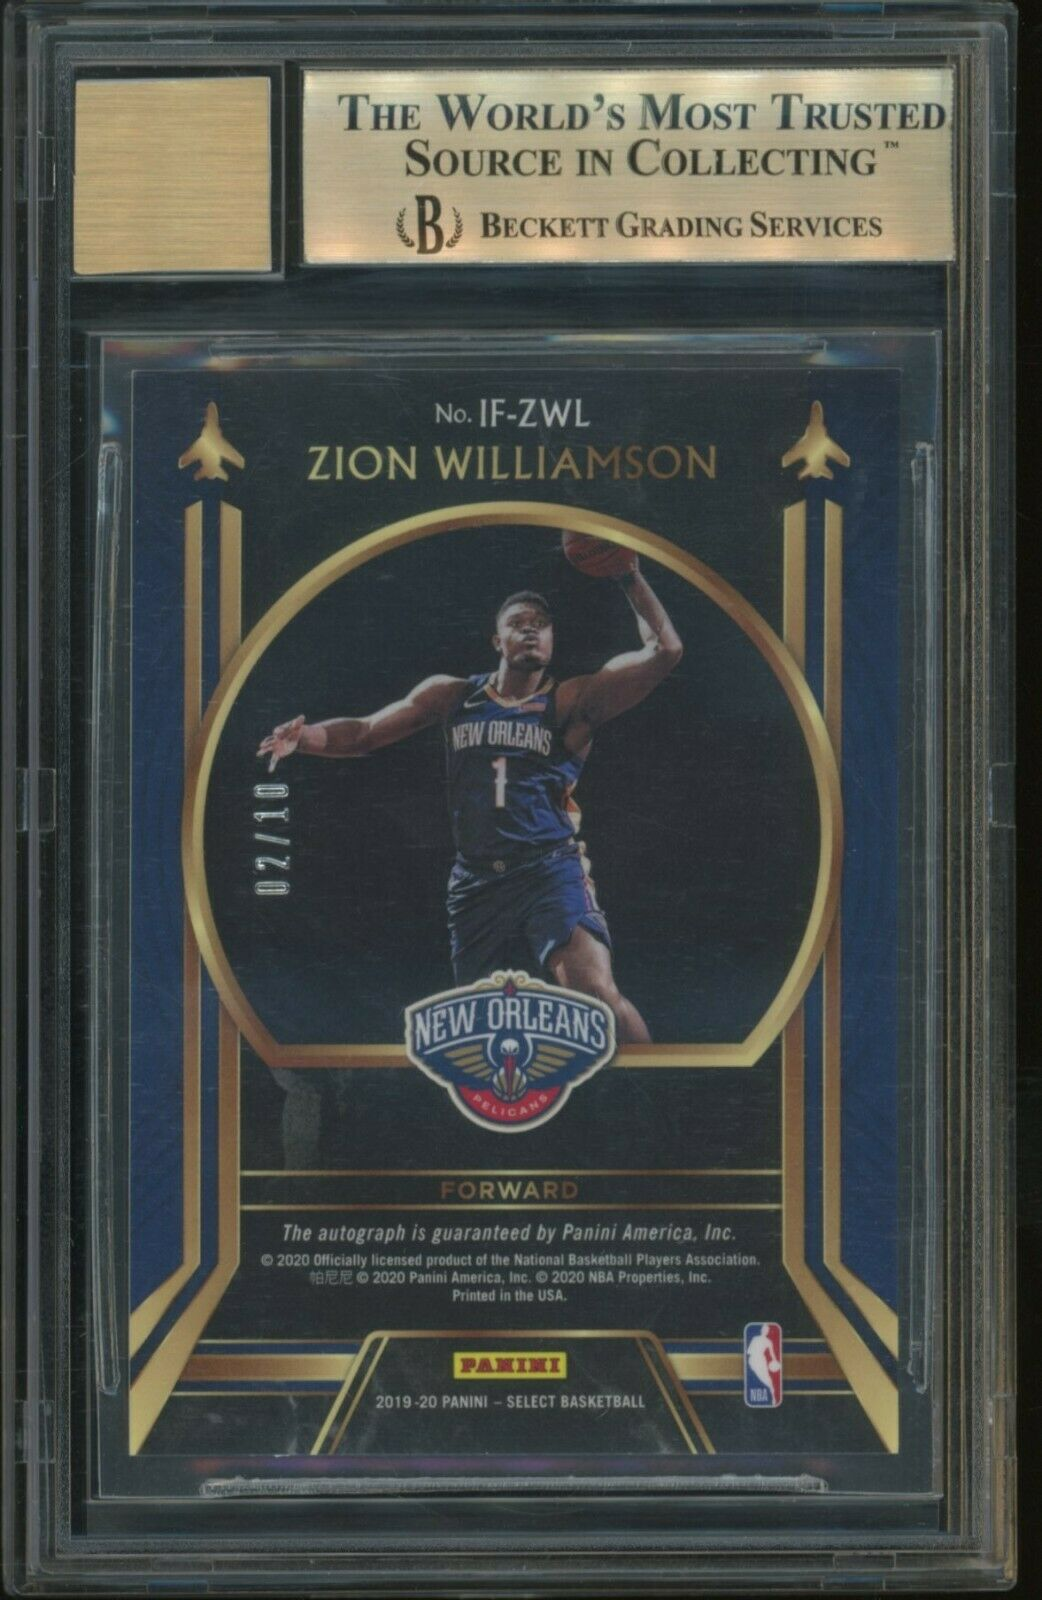 2019-20 Select Gold Prizm In Flight #1 Zion Williamson RC AUTO /10 BGS 9.5 w/ 10 - Image 2